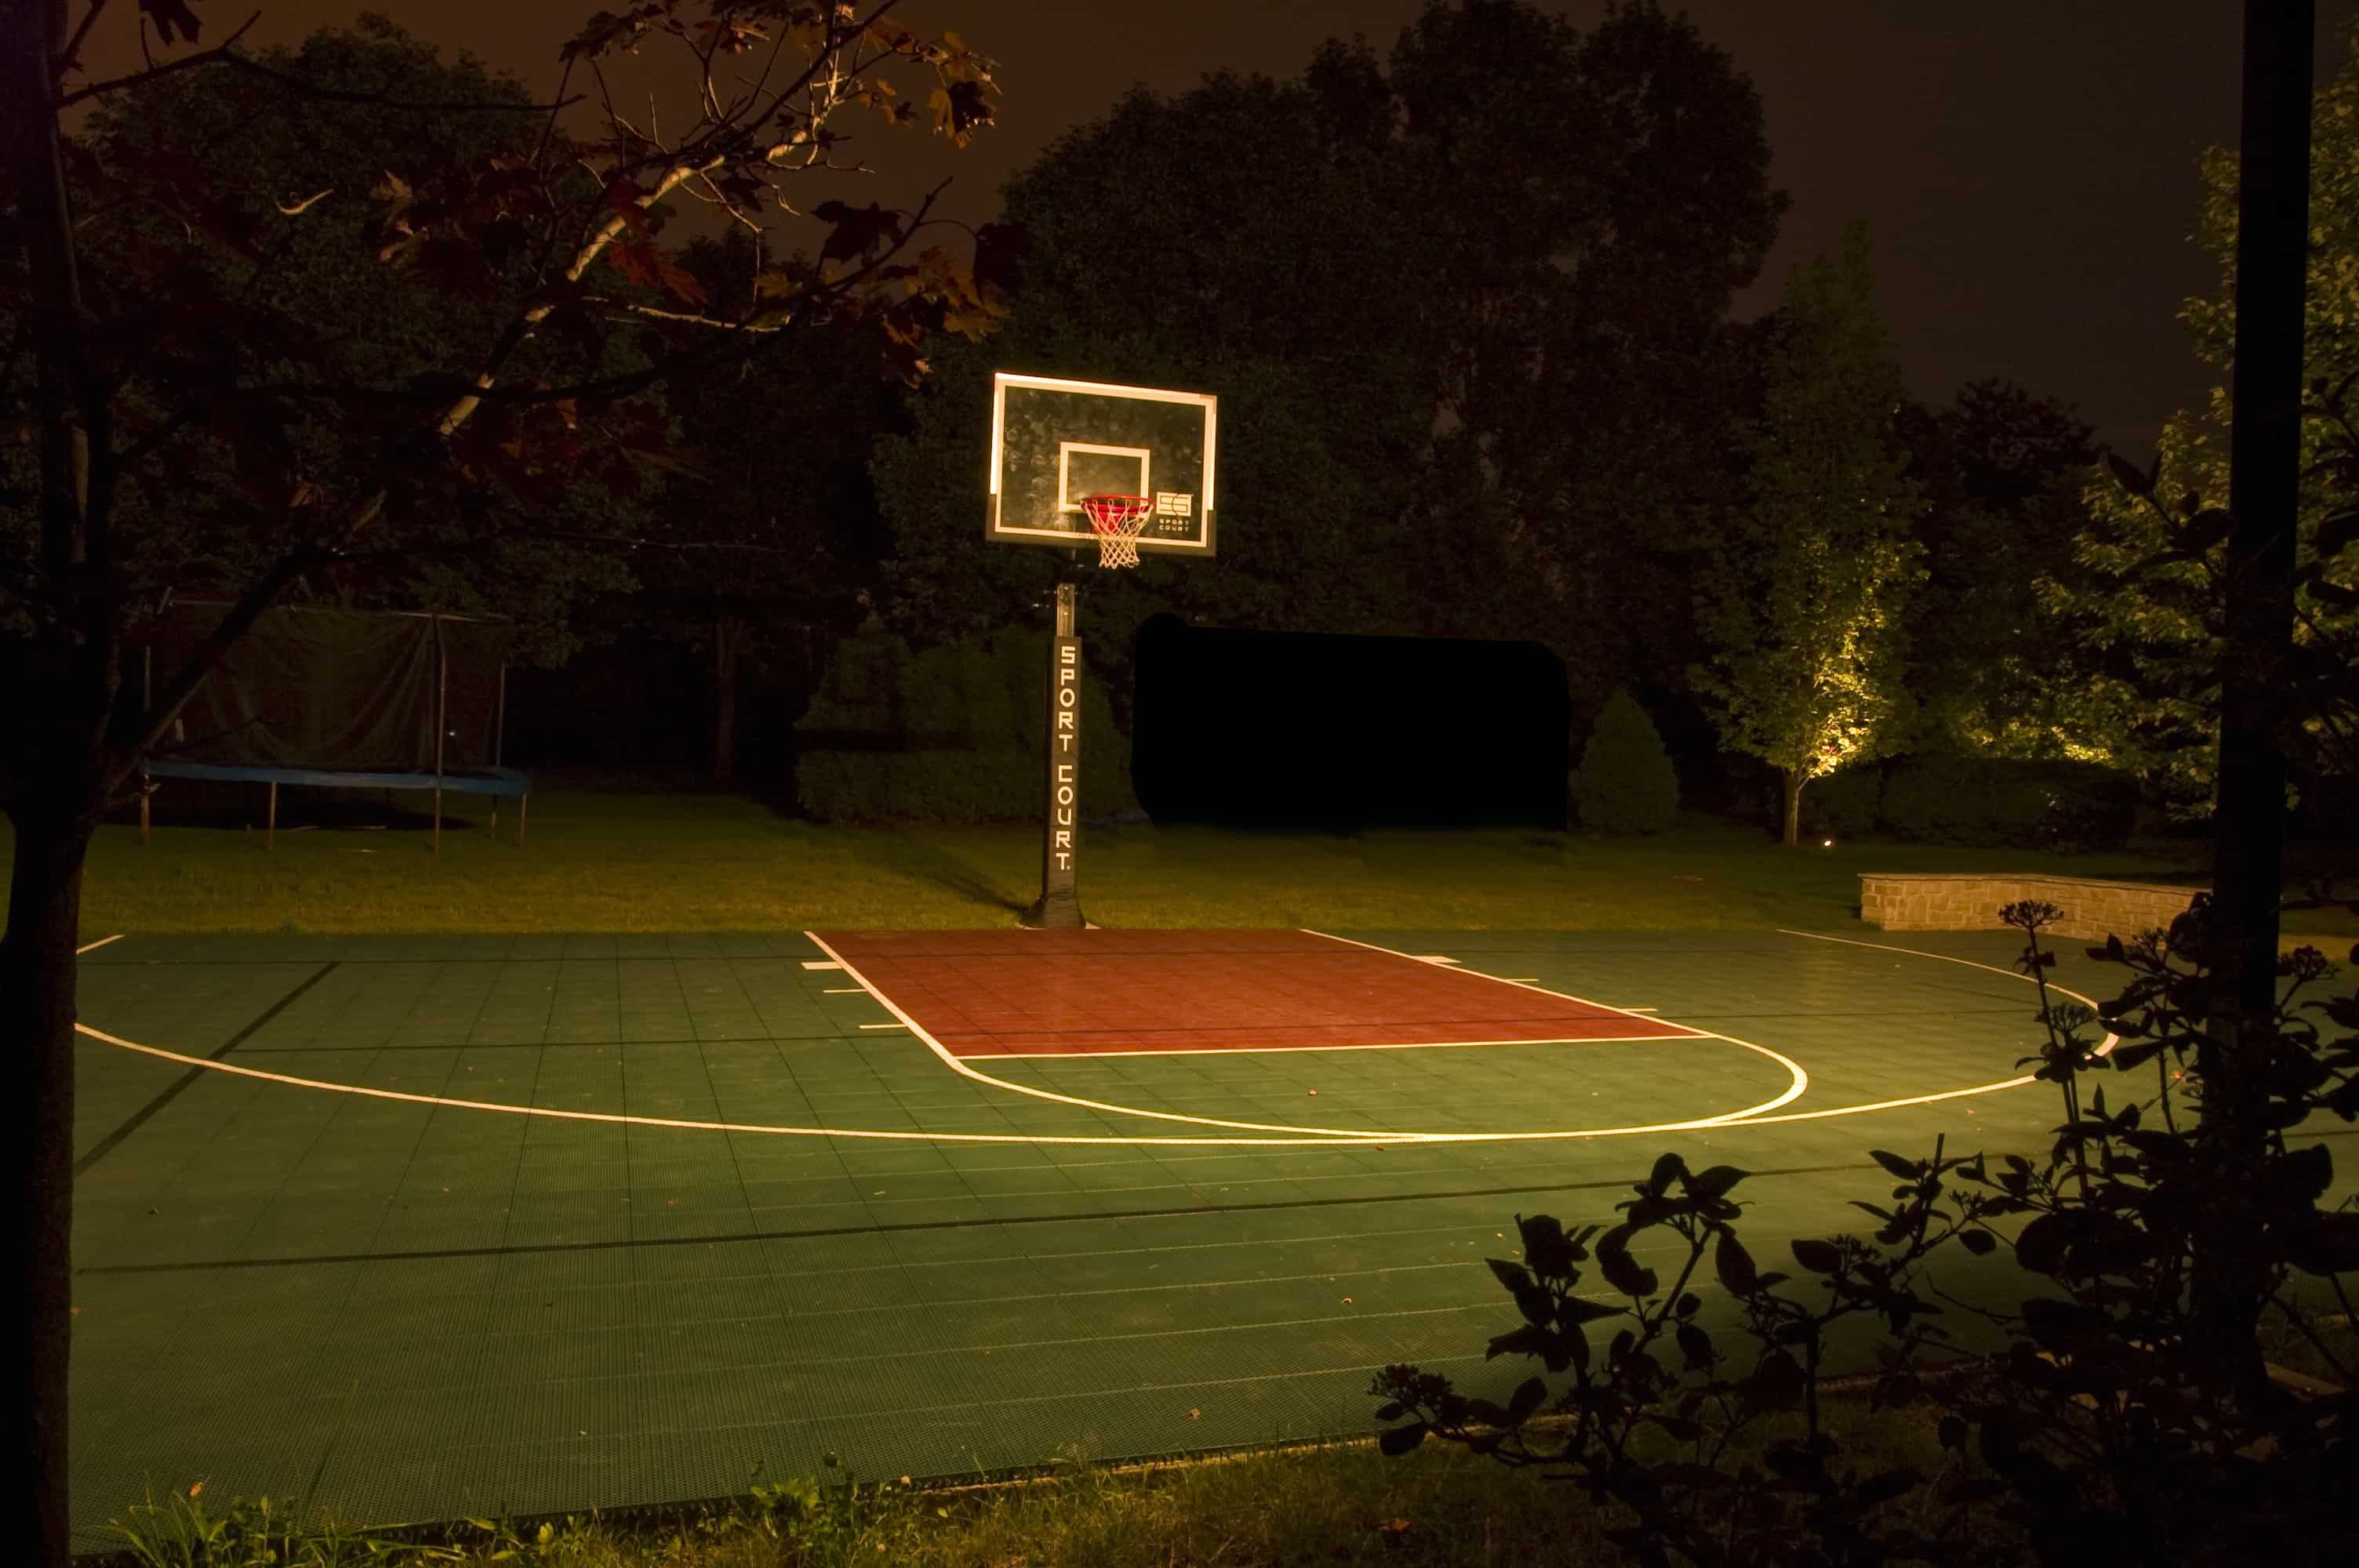 Burr ridge basketball court lighting outdoor lighting in chicago home burr ridge basketball court lighting aloadofball Gallery